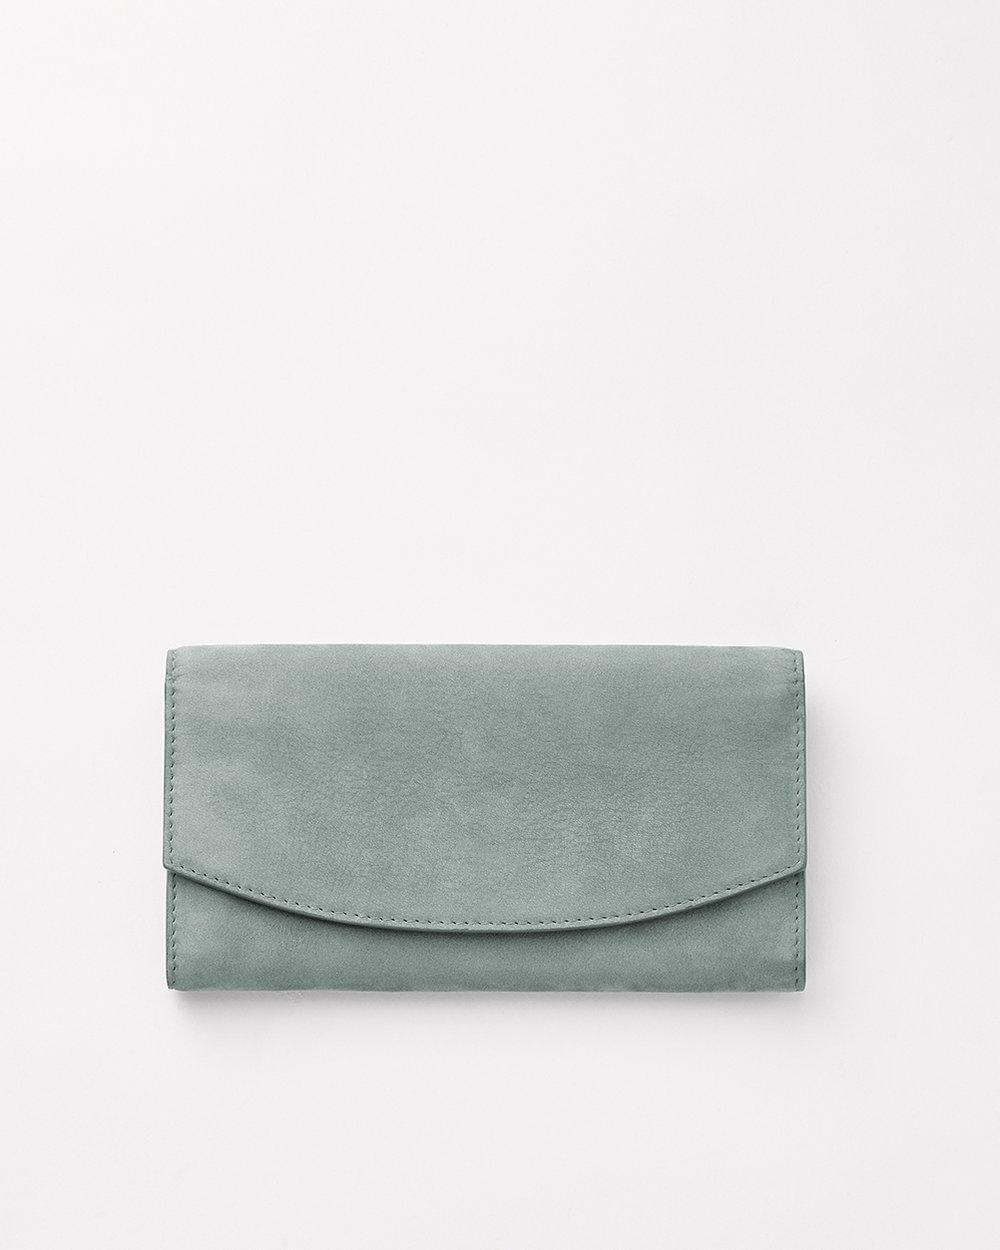 corie humble skagen wallet blue suede